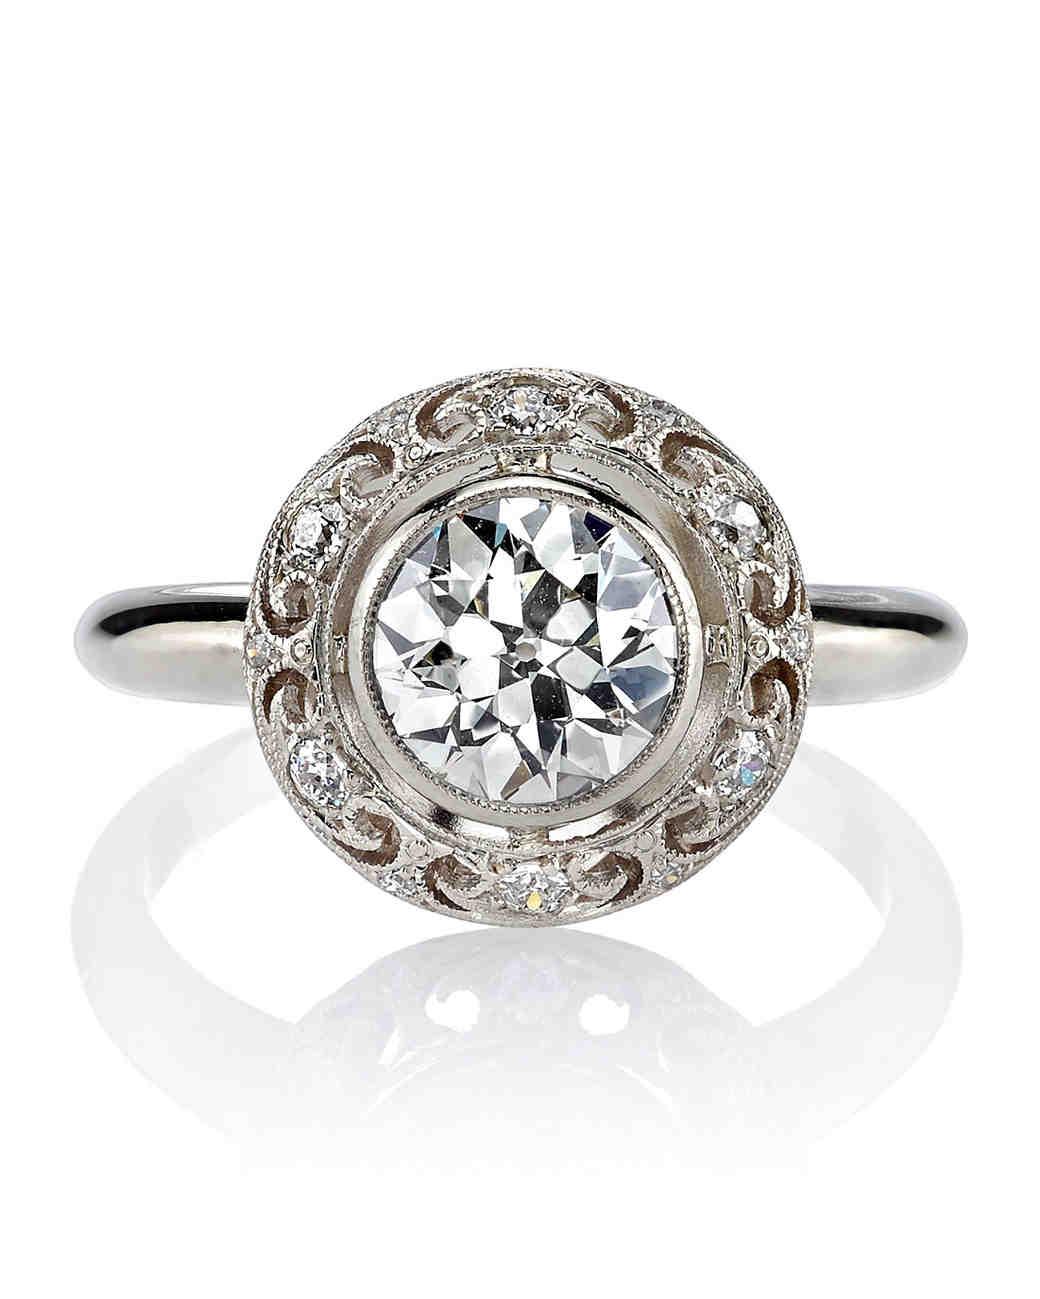 Single Stone White Gold Engagement Ring